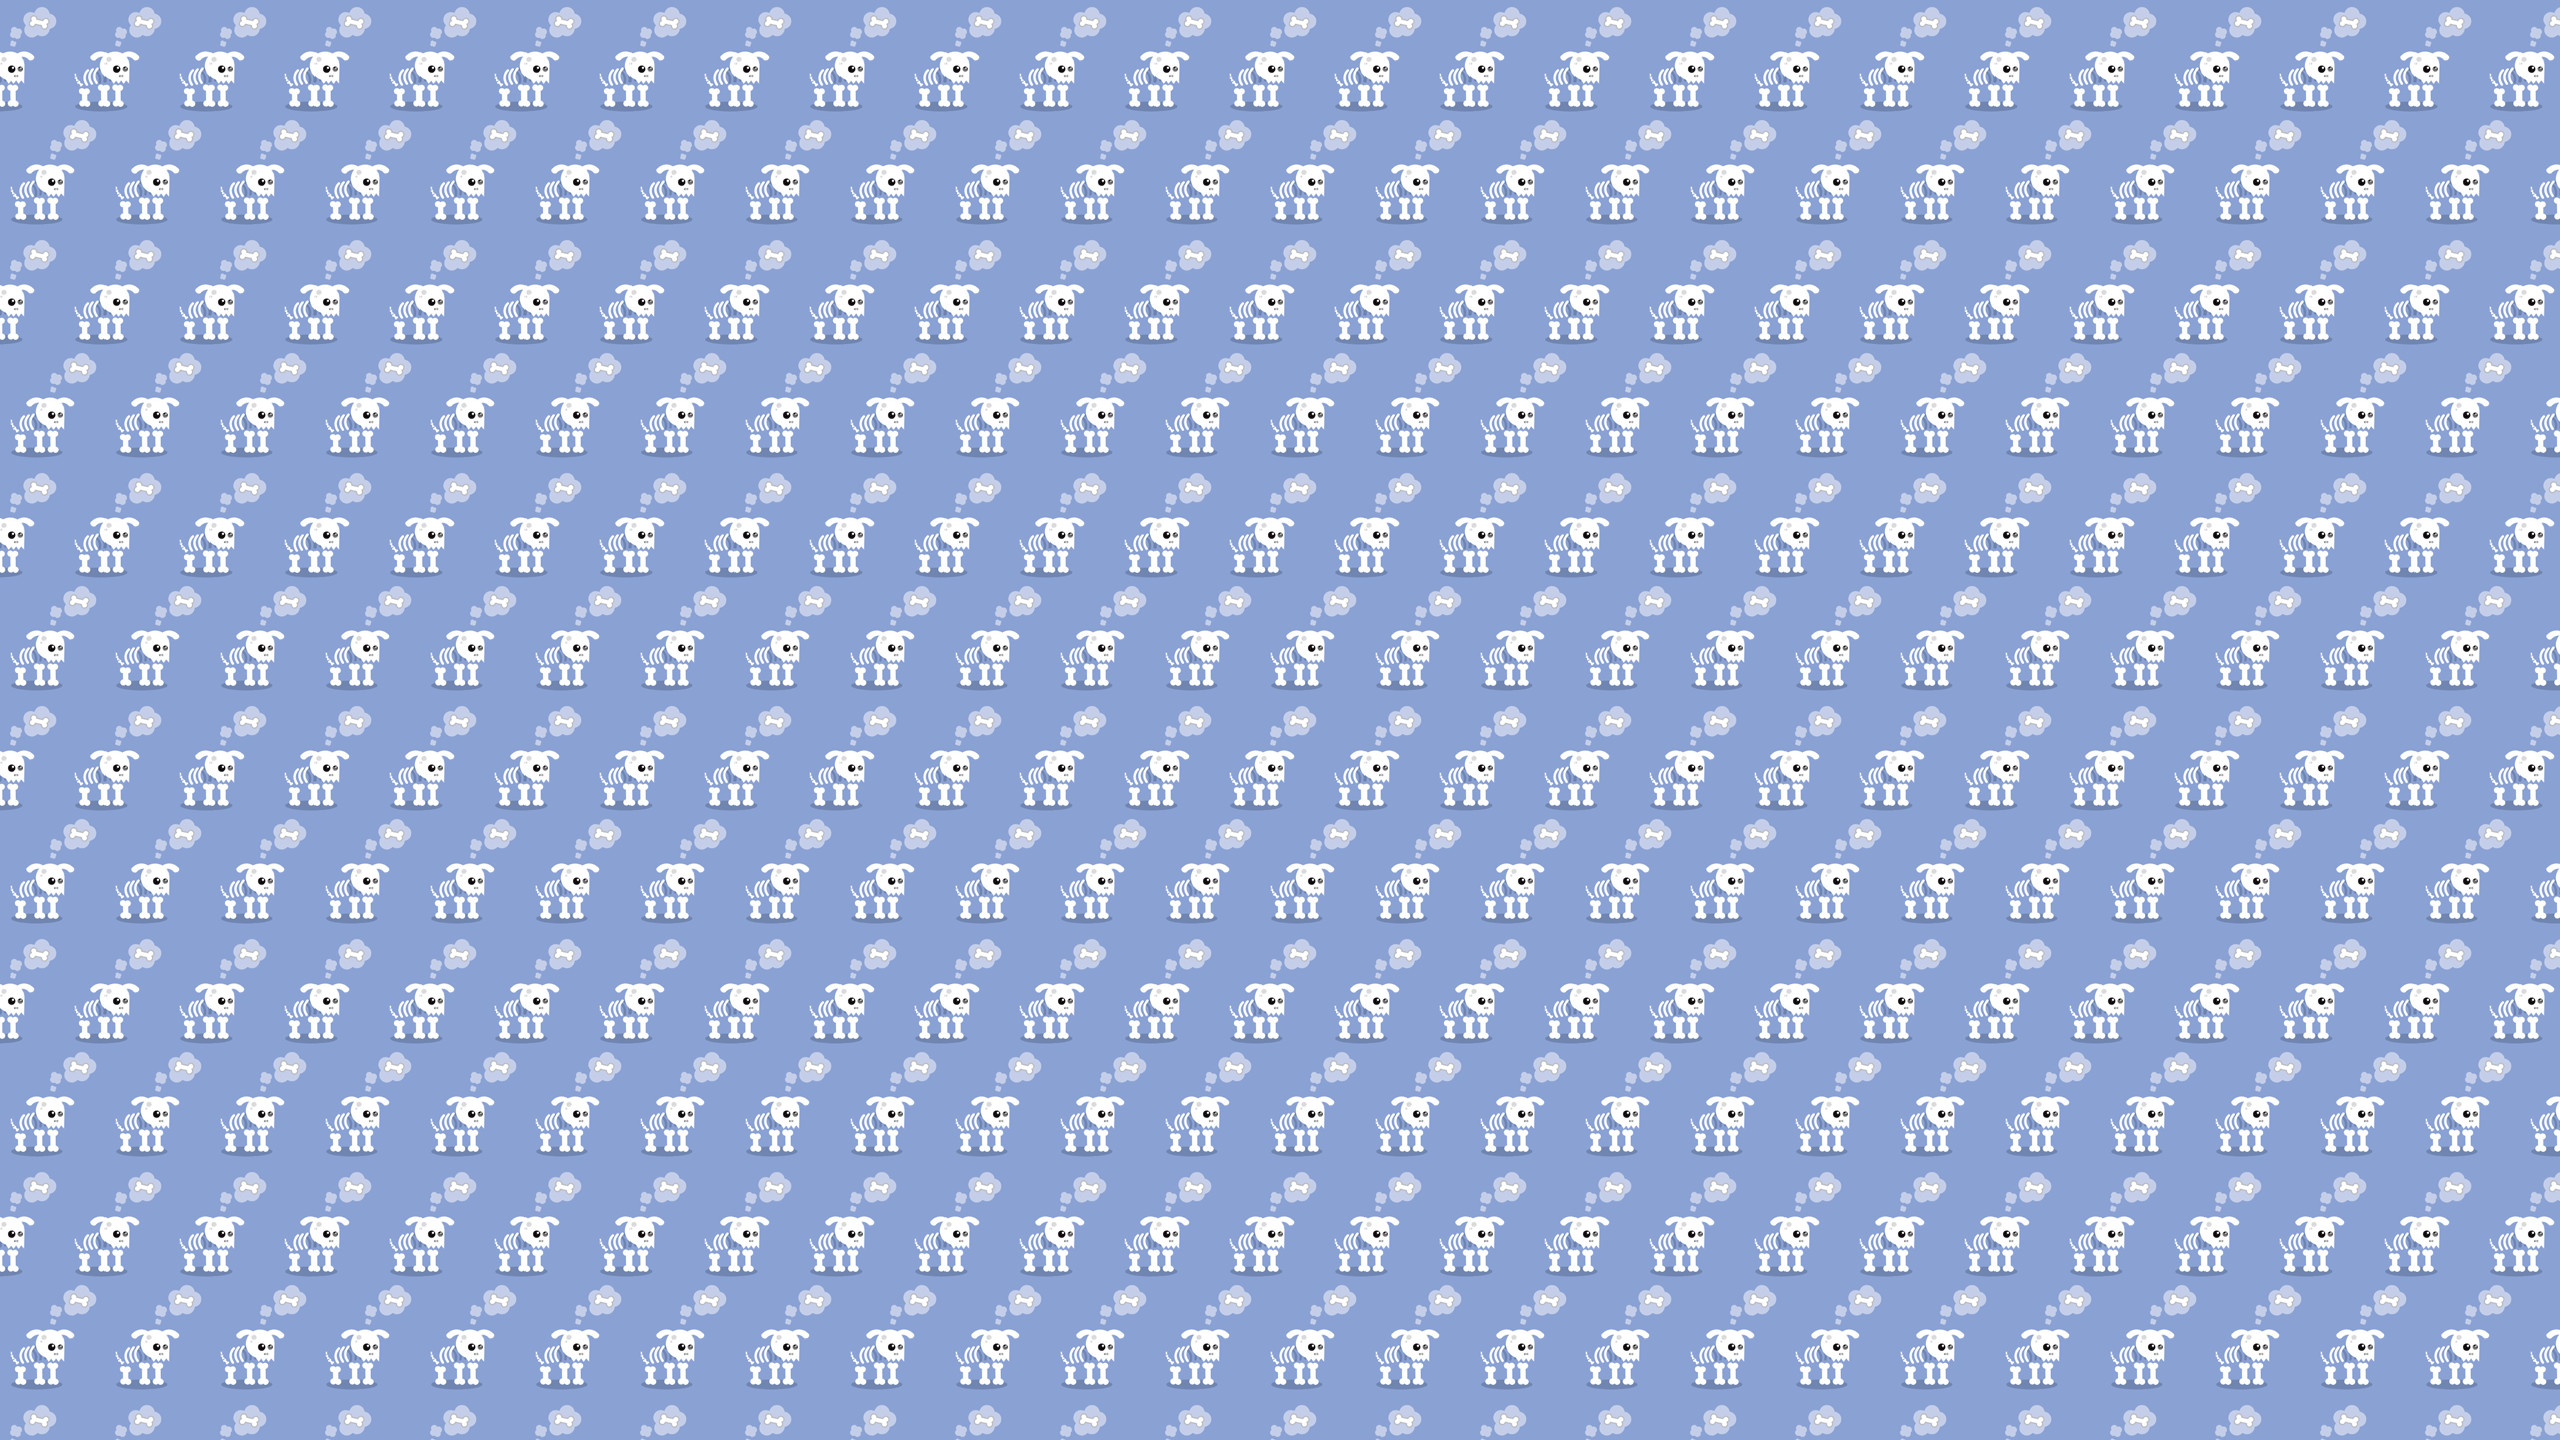 Dog Paws Wallpaper 41 Images Pin Color Dots Desktop On Pinterest 2160x2059 Bone